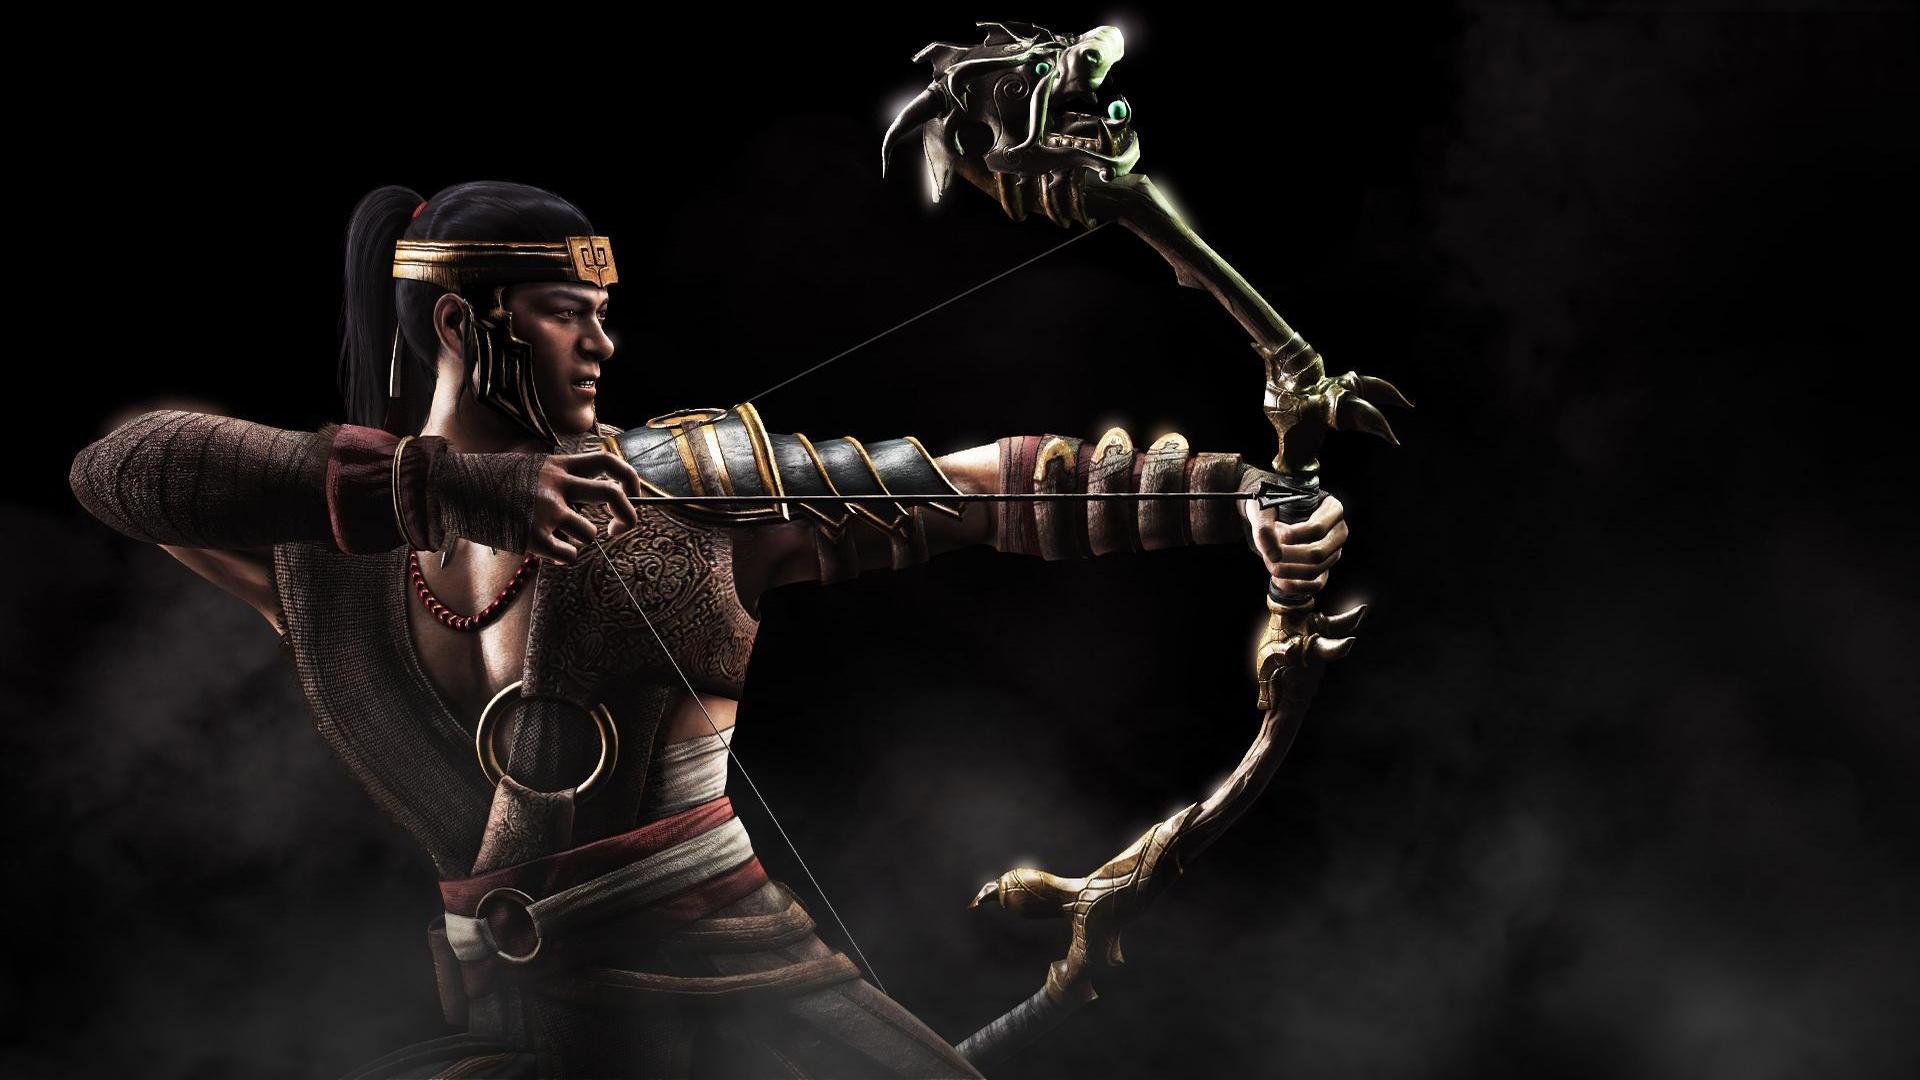 Wallpaper Mortal Kombat X Guitarist Kung Jin Darkness